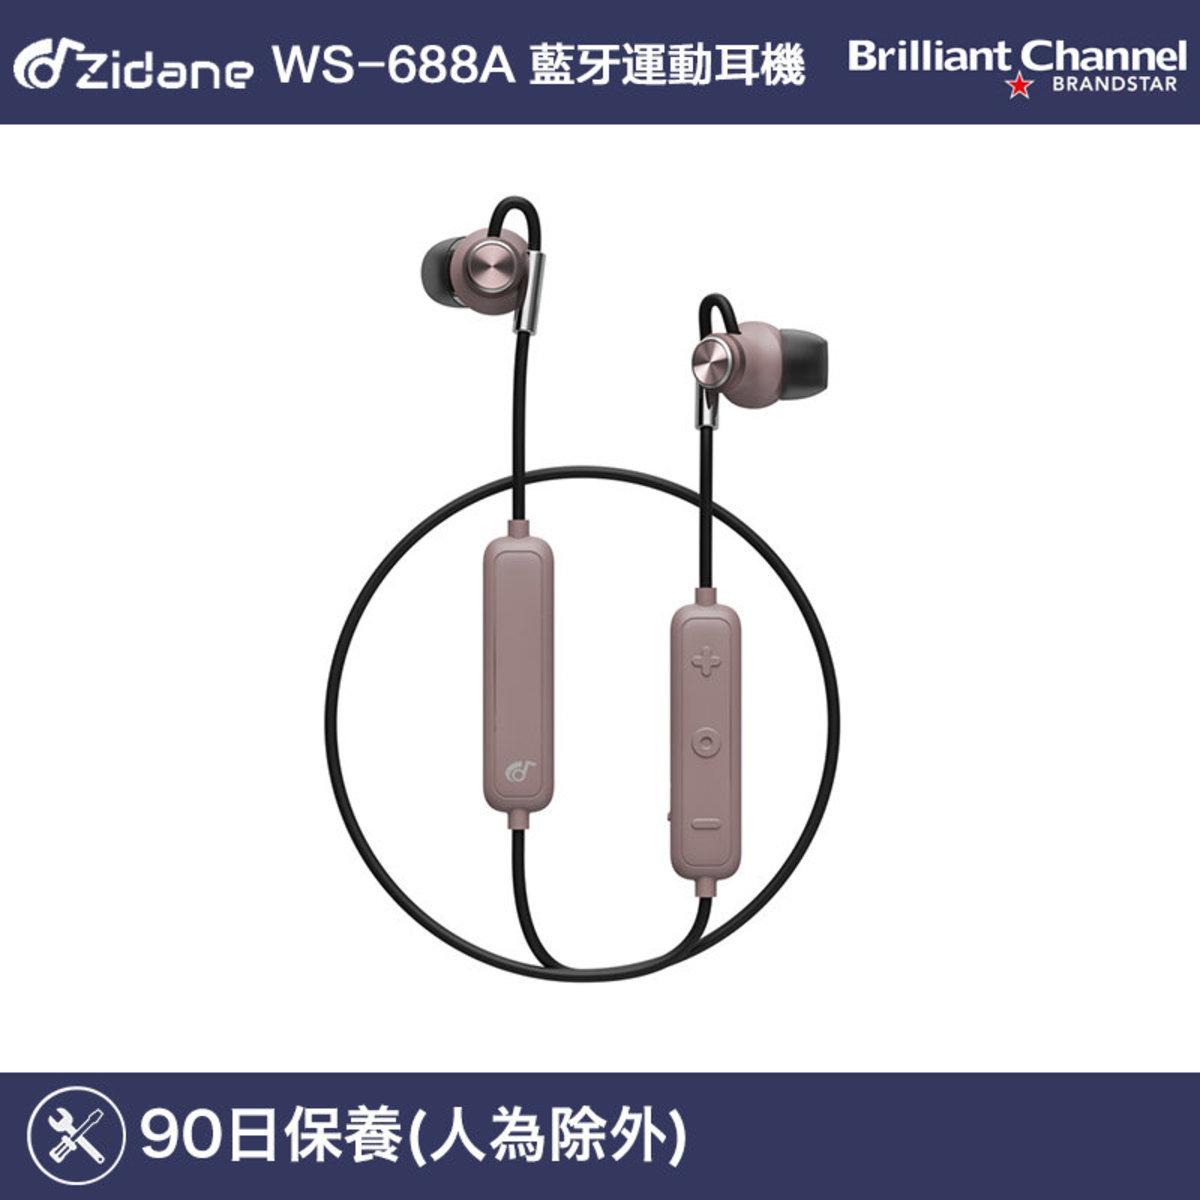 WS-688A 藍牙運動耳機 (褐色)